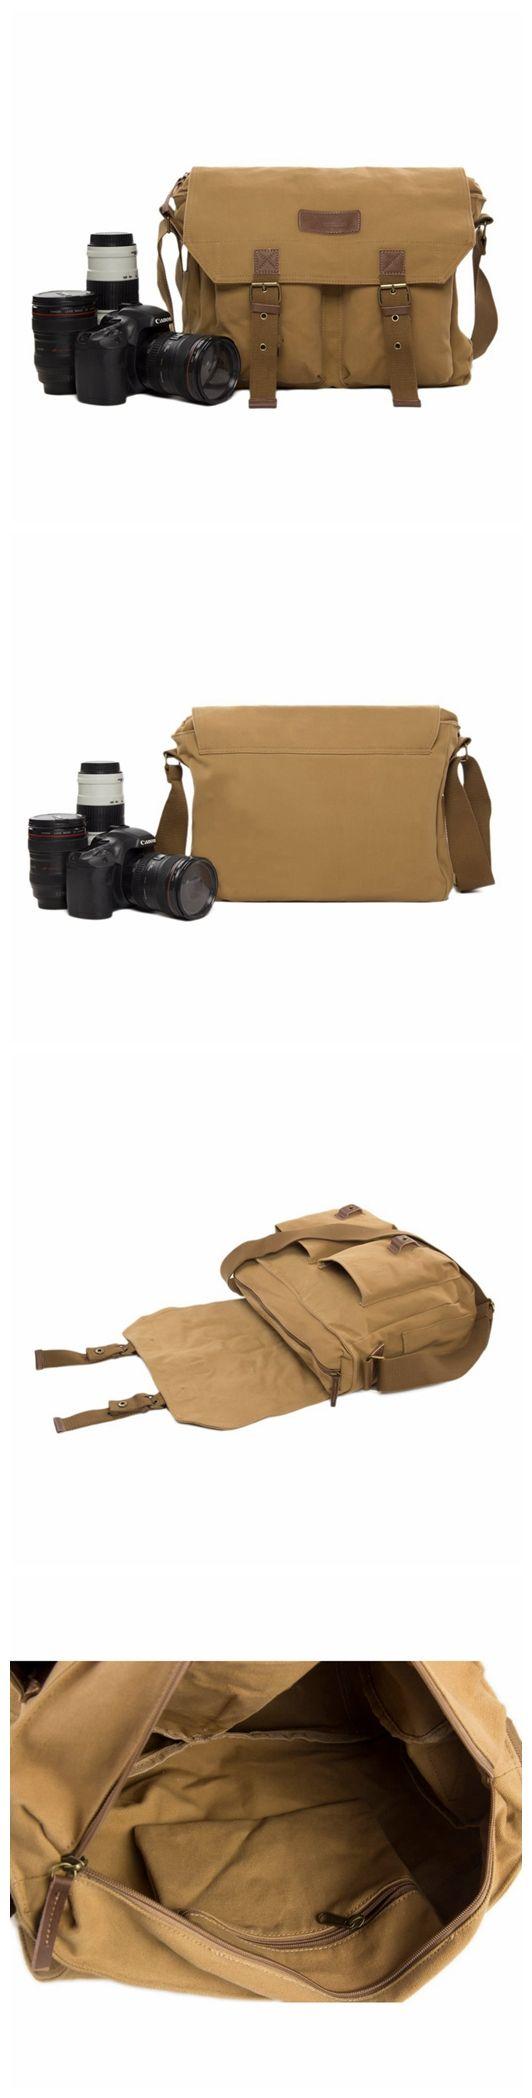 Flash Sale Khaki Canvas DSLR Camera Bag, Professional SLR Camera Purse Fit Canon Nikon F1003 #camerapurse